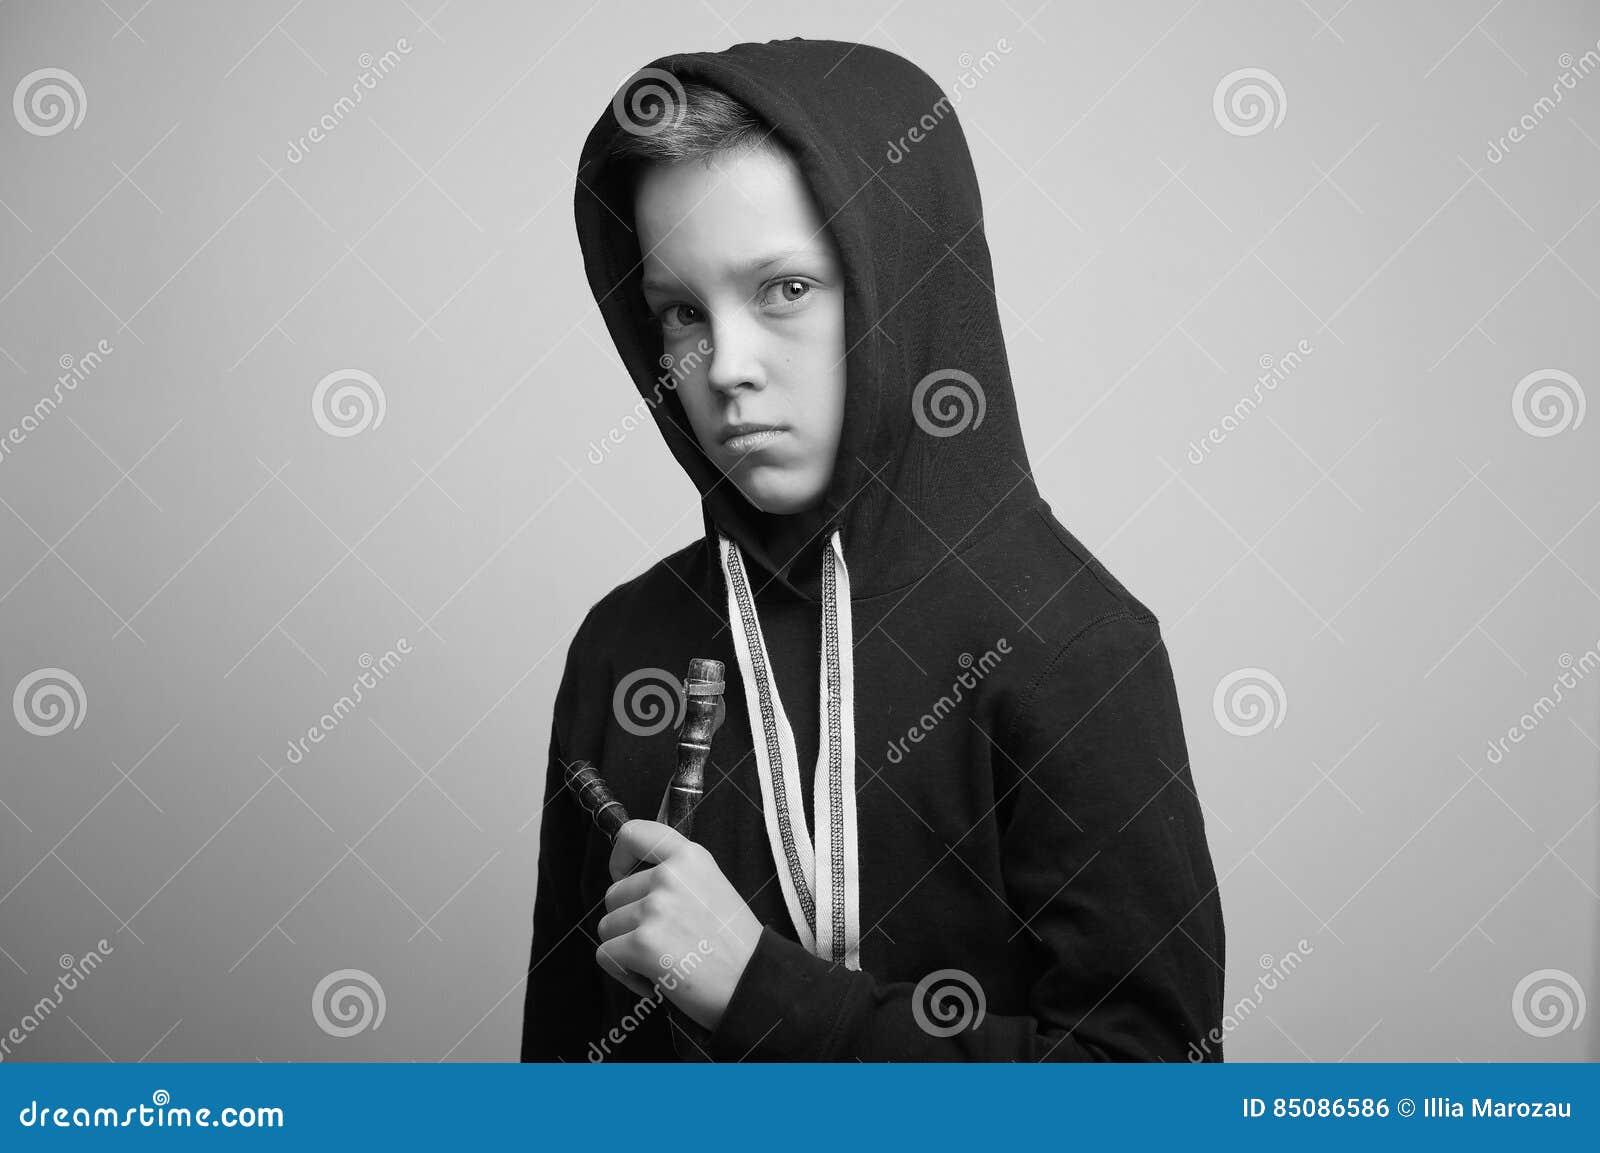 teenage bad boy with slingshot and stylish haircut studio shot